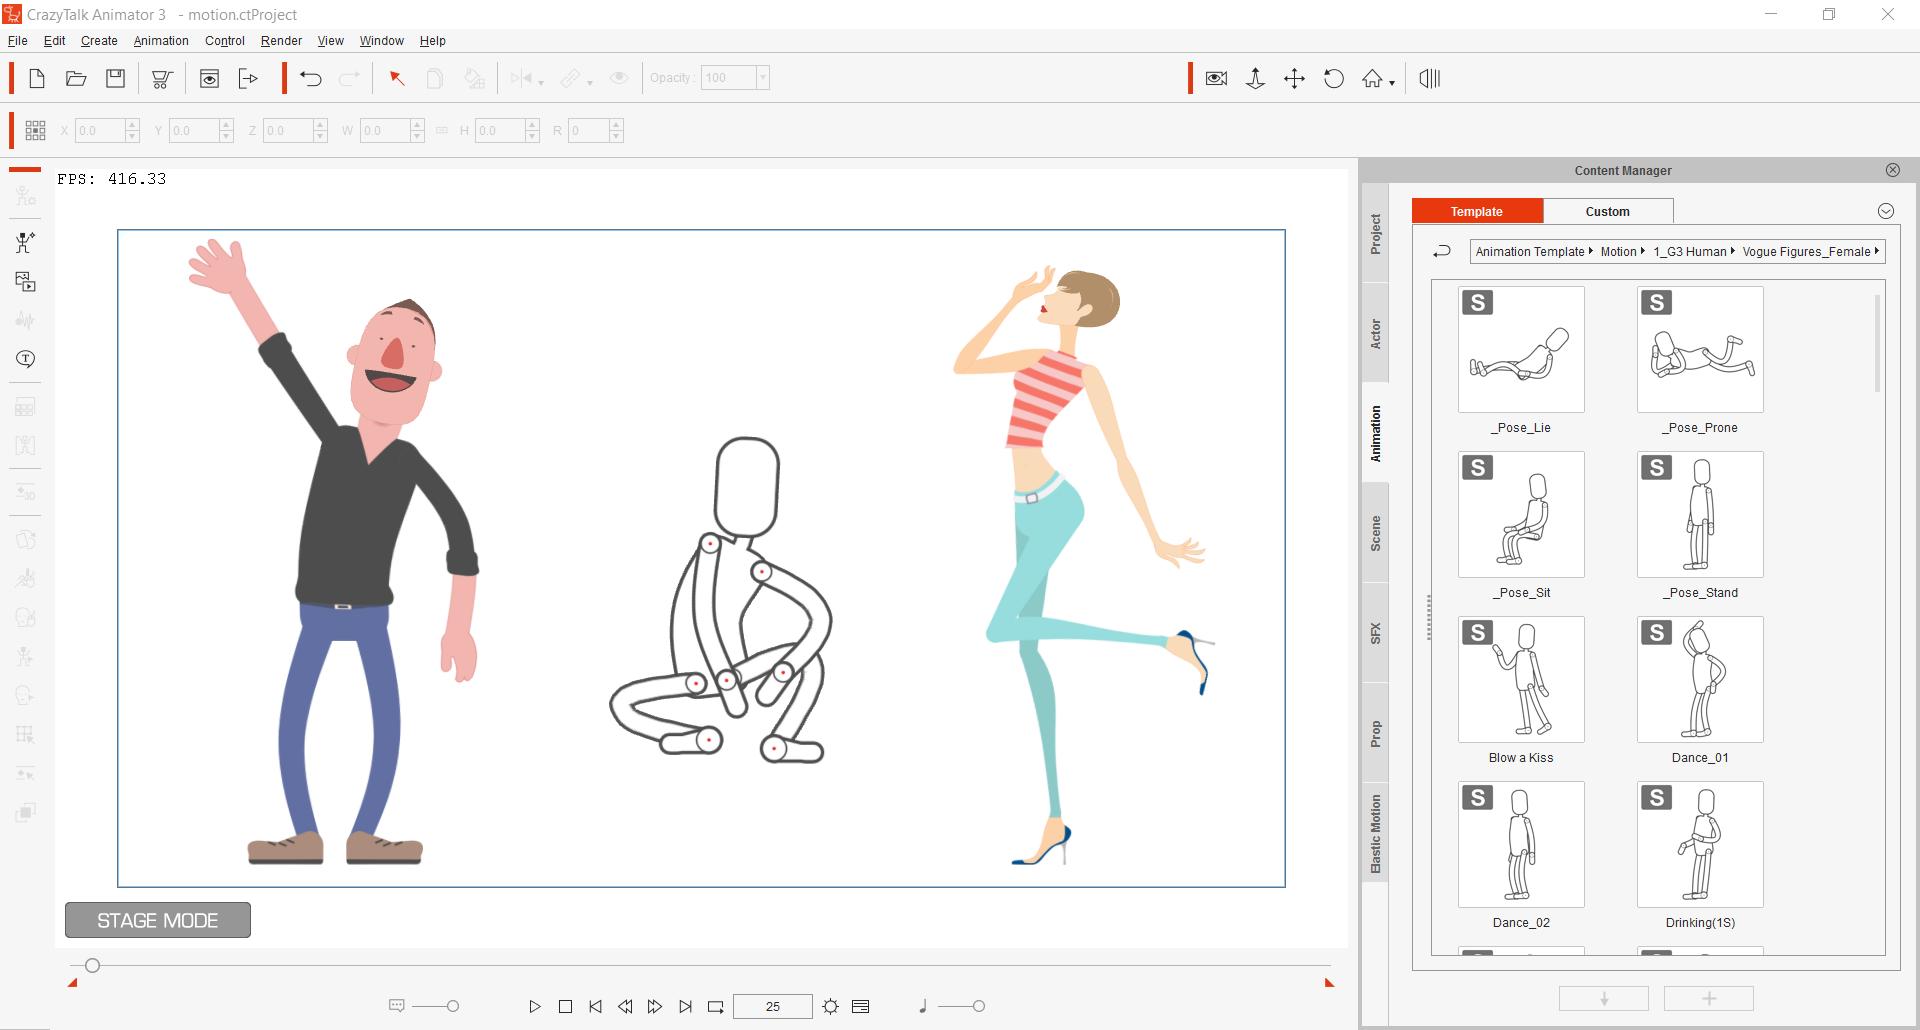 crazytalk-animator-4996_2_4996.png